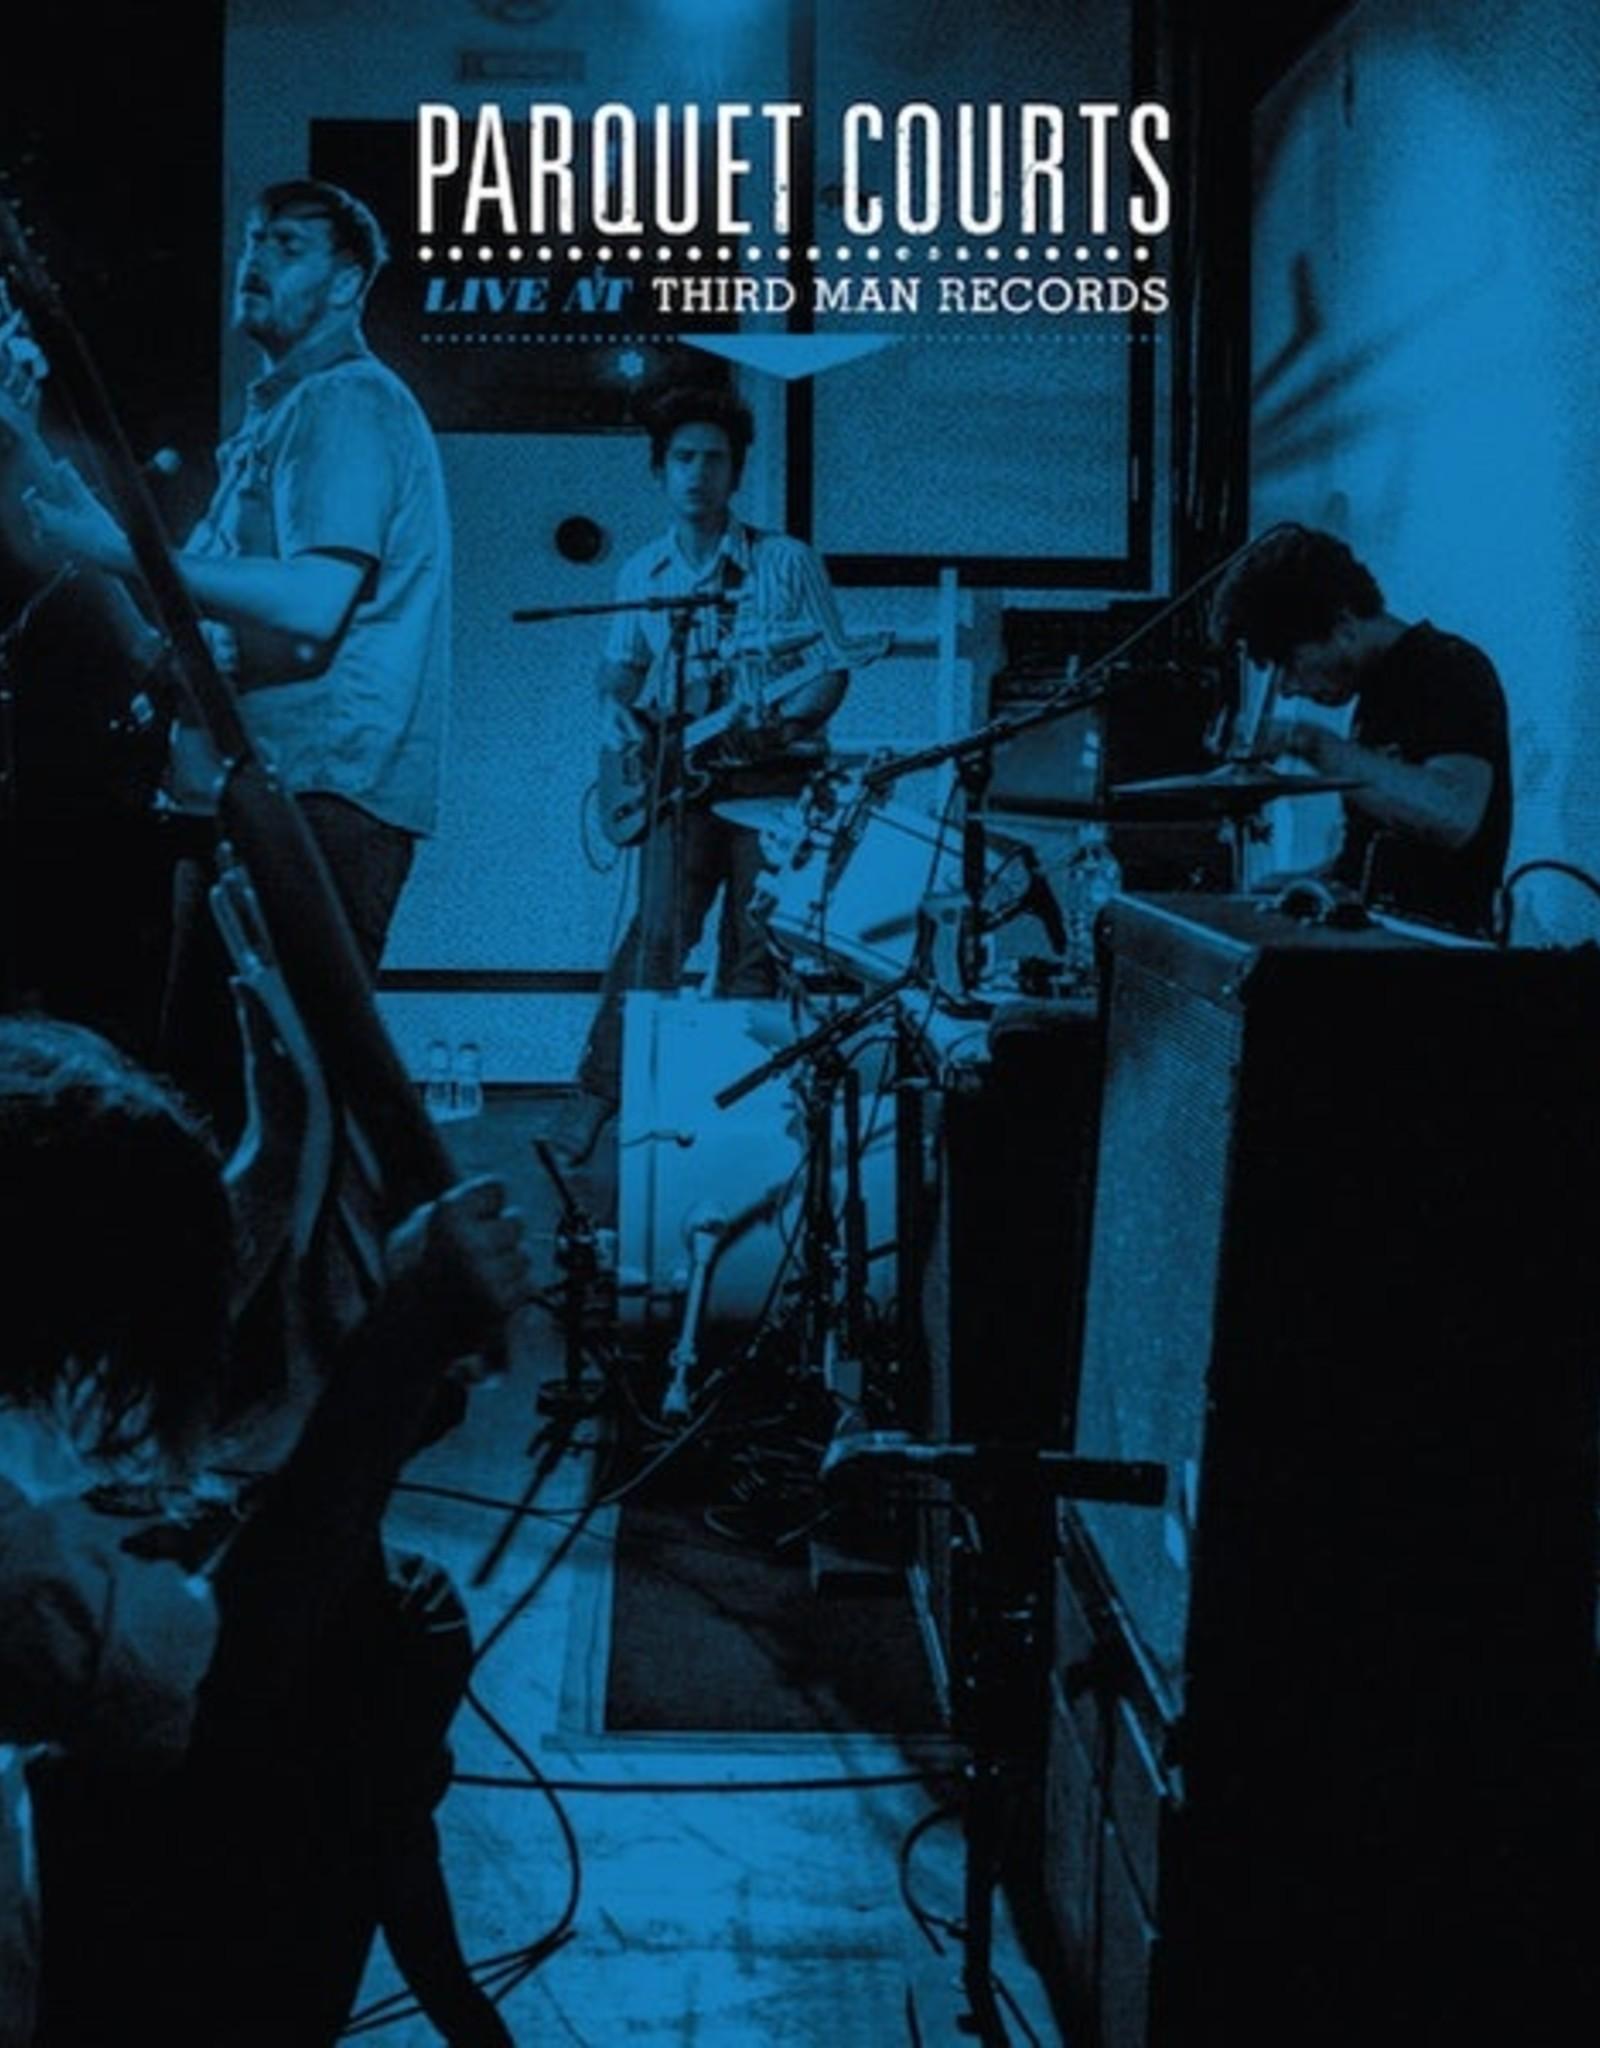 "Parquet Courts - Live At Third Man Records (12"" Vinyl)"